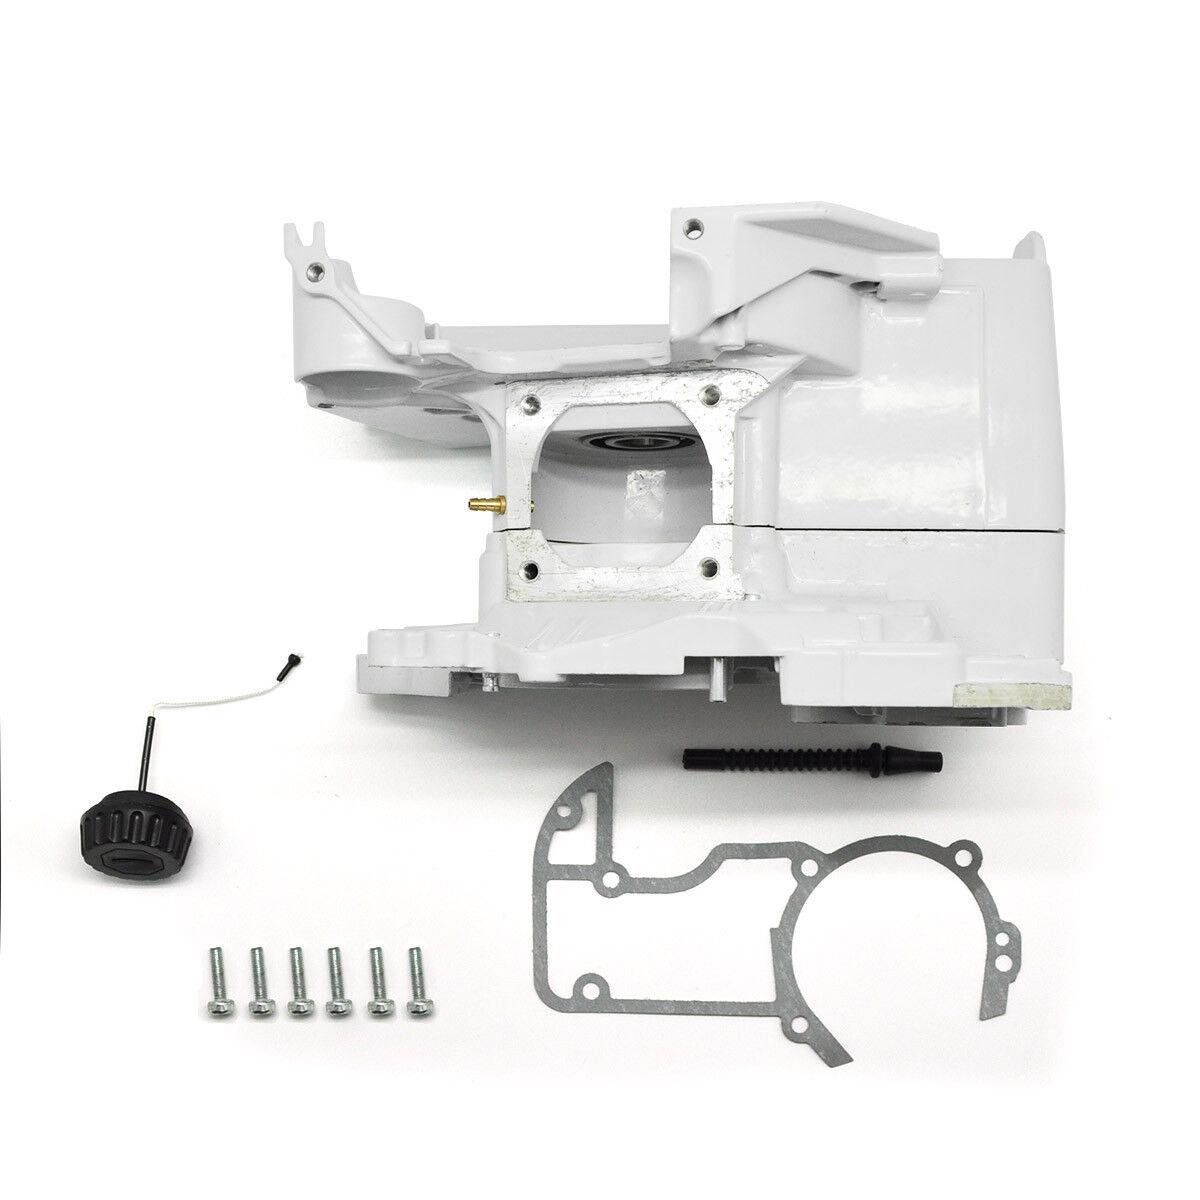 Cárter guley con tapón de llenado de combustible adapta a Motosierra Stihl 066 MS660 1122 020 2113